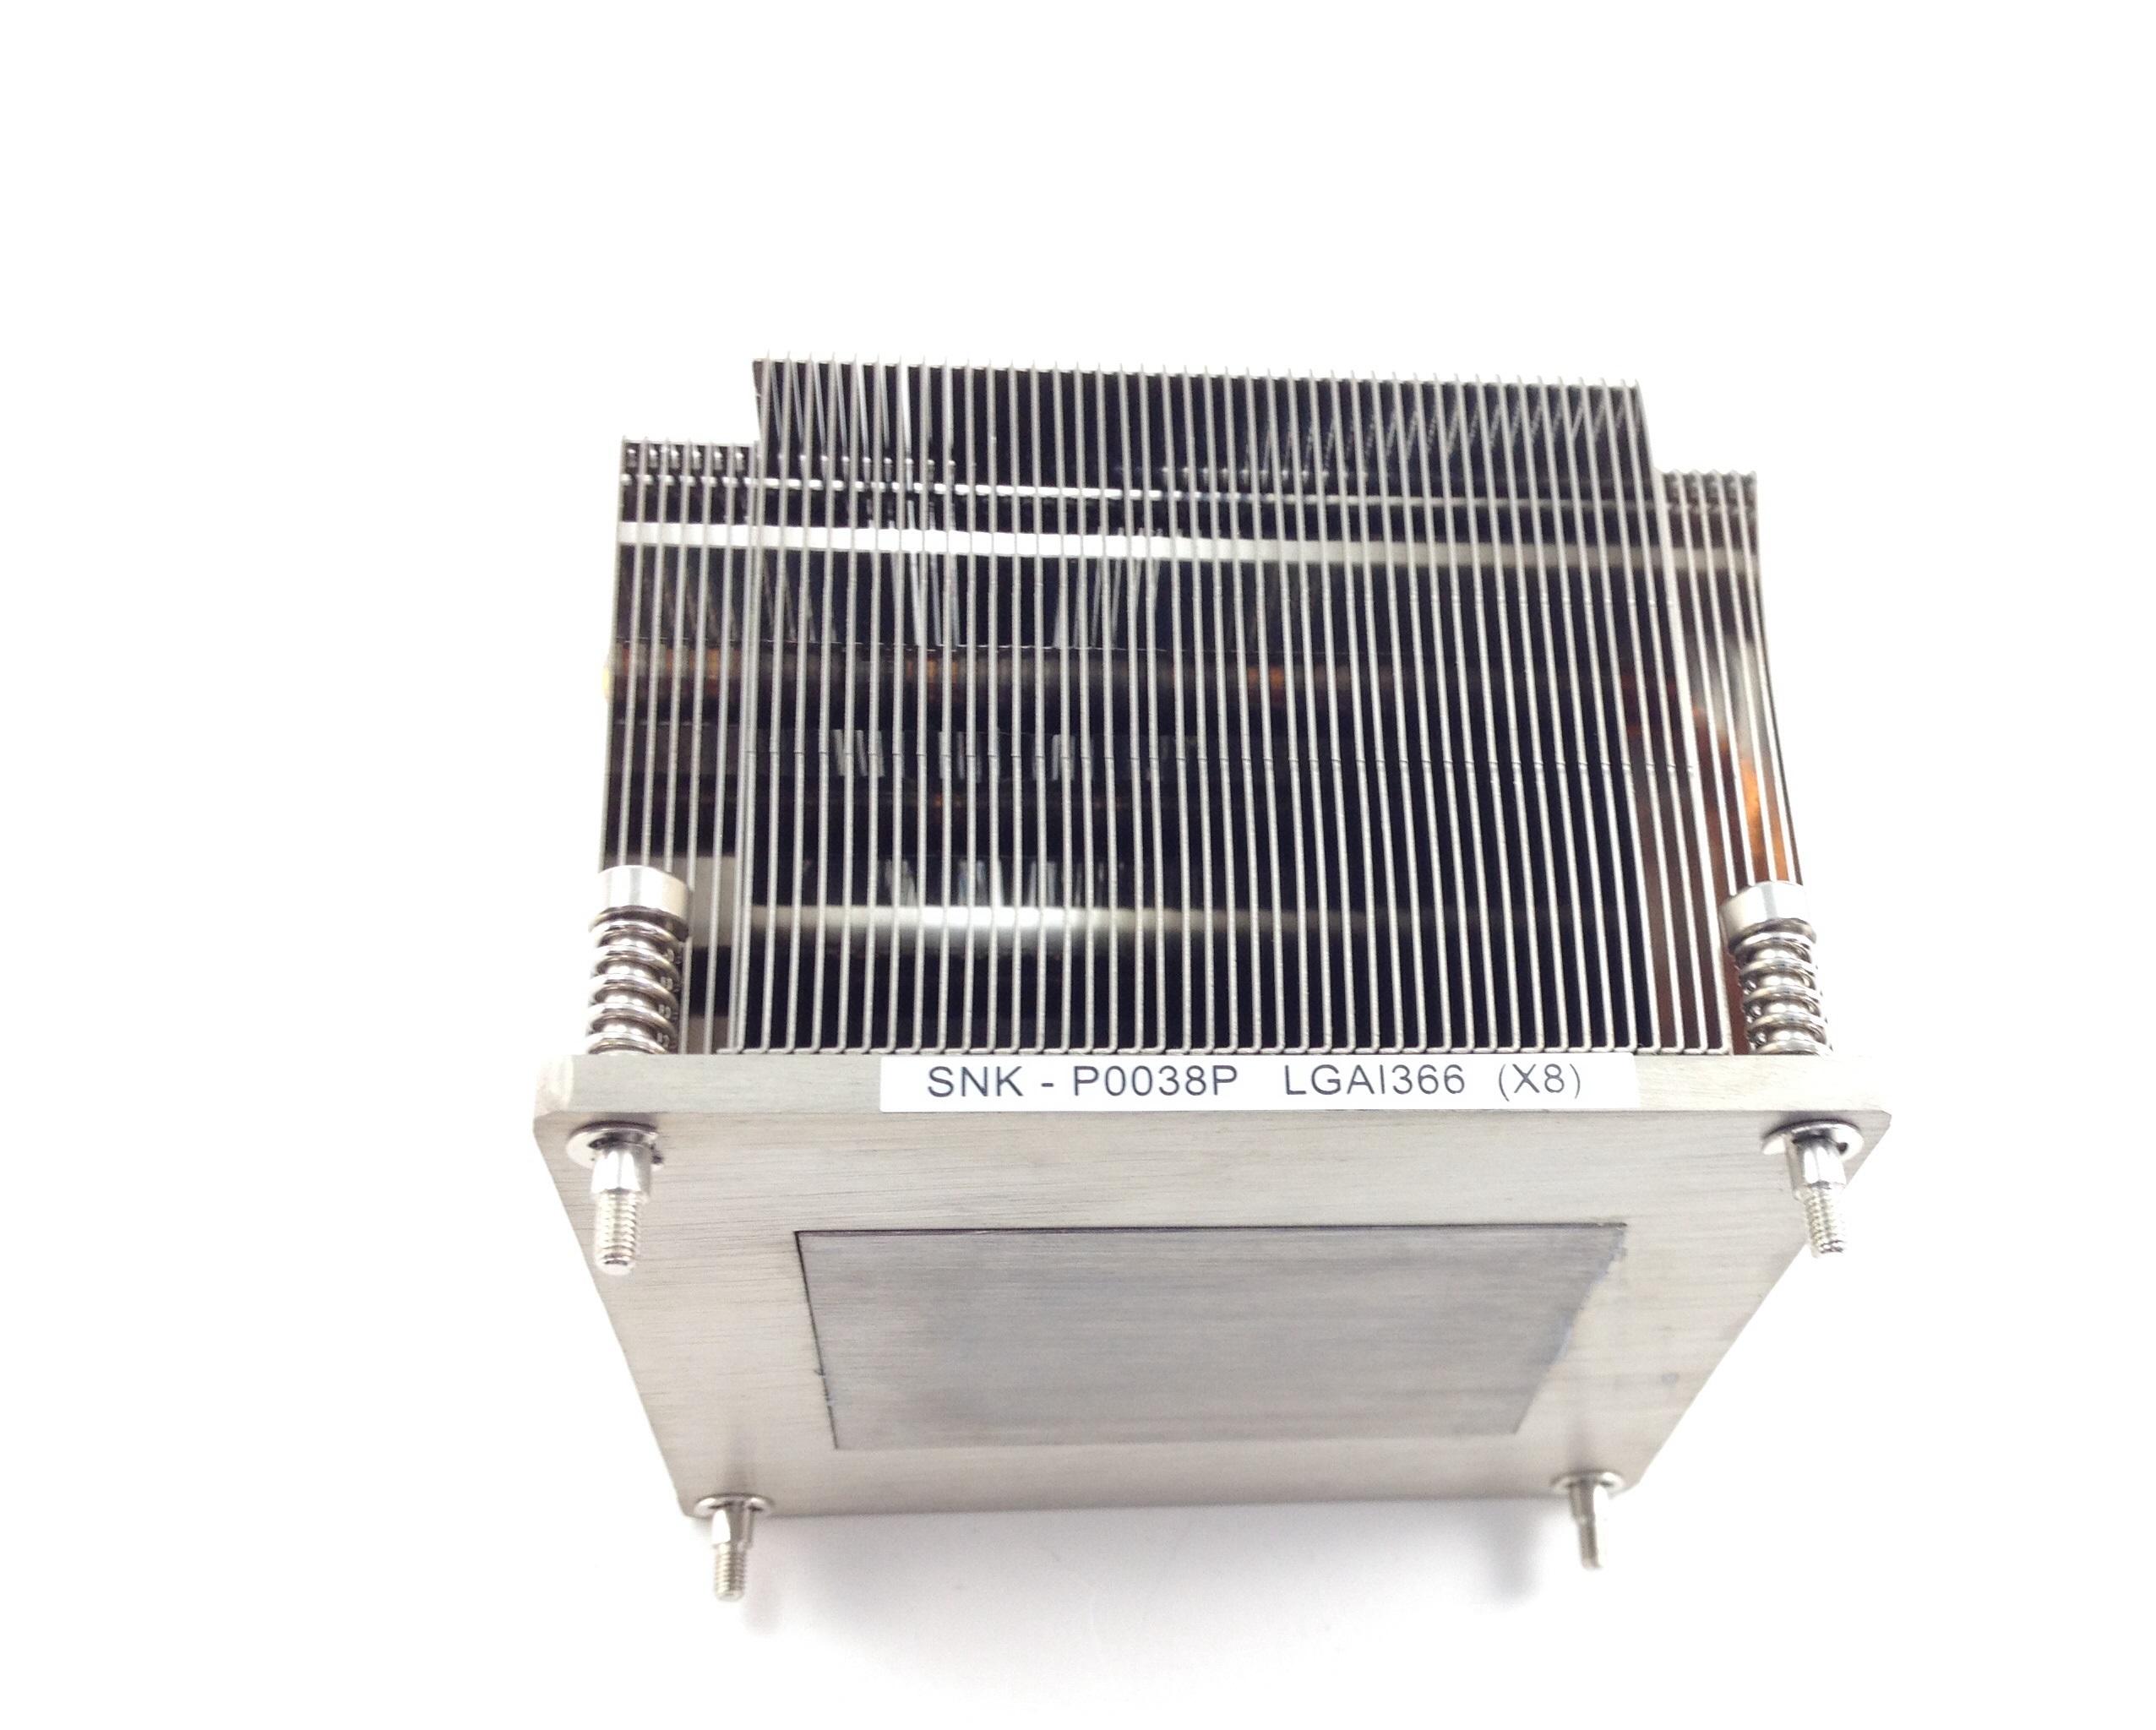 Supermicro 2U SNK-P0038P LGA1366 (X8) Intel Xeon Socket Heatsink (SNK-P0038P)